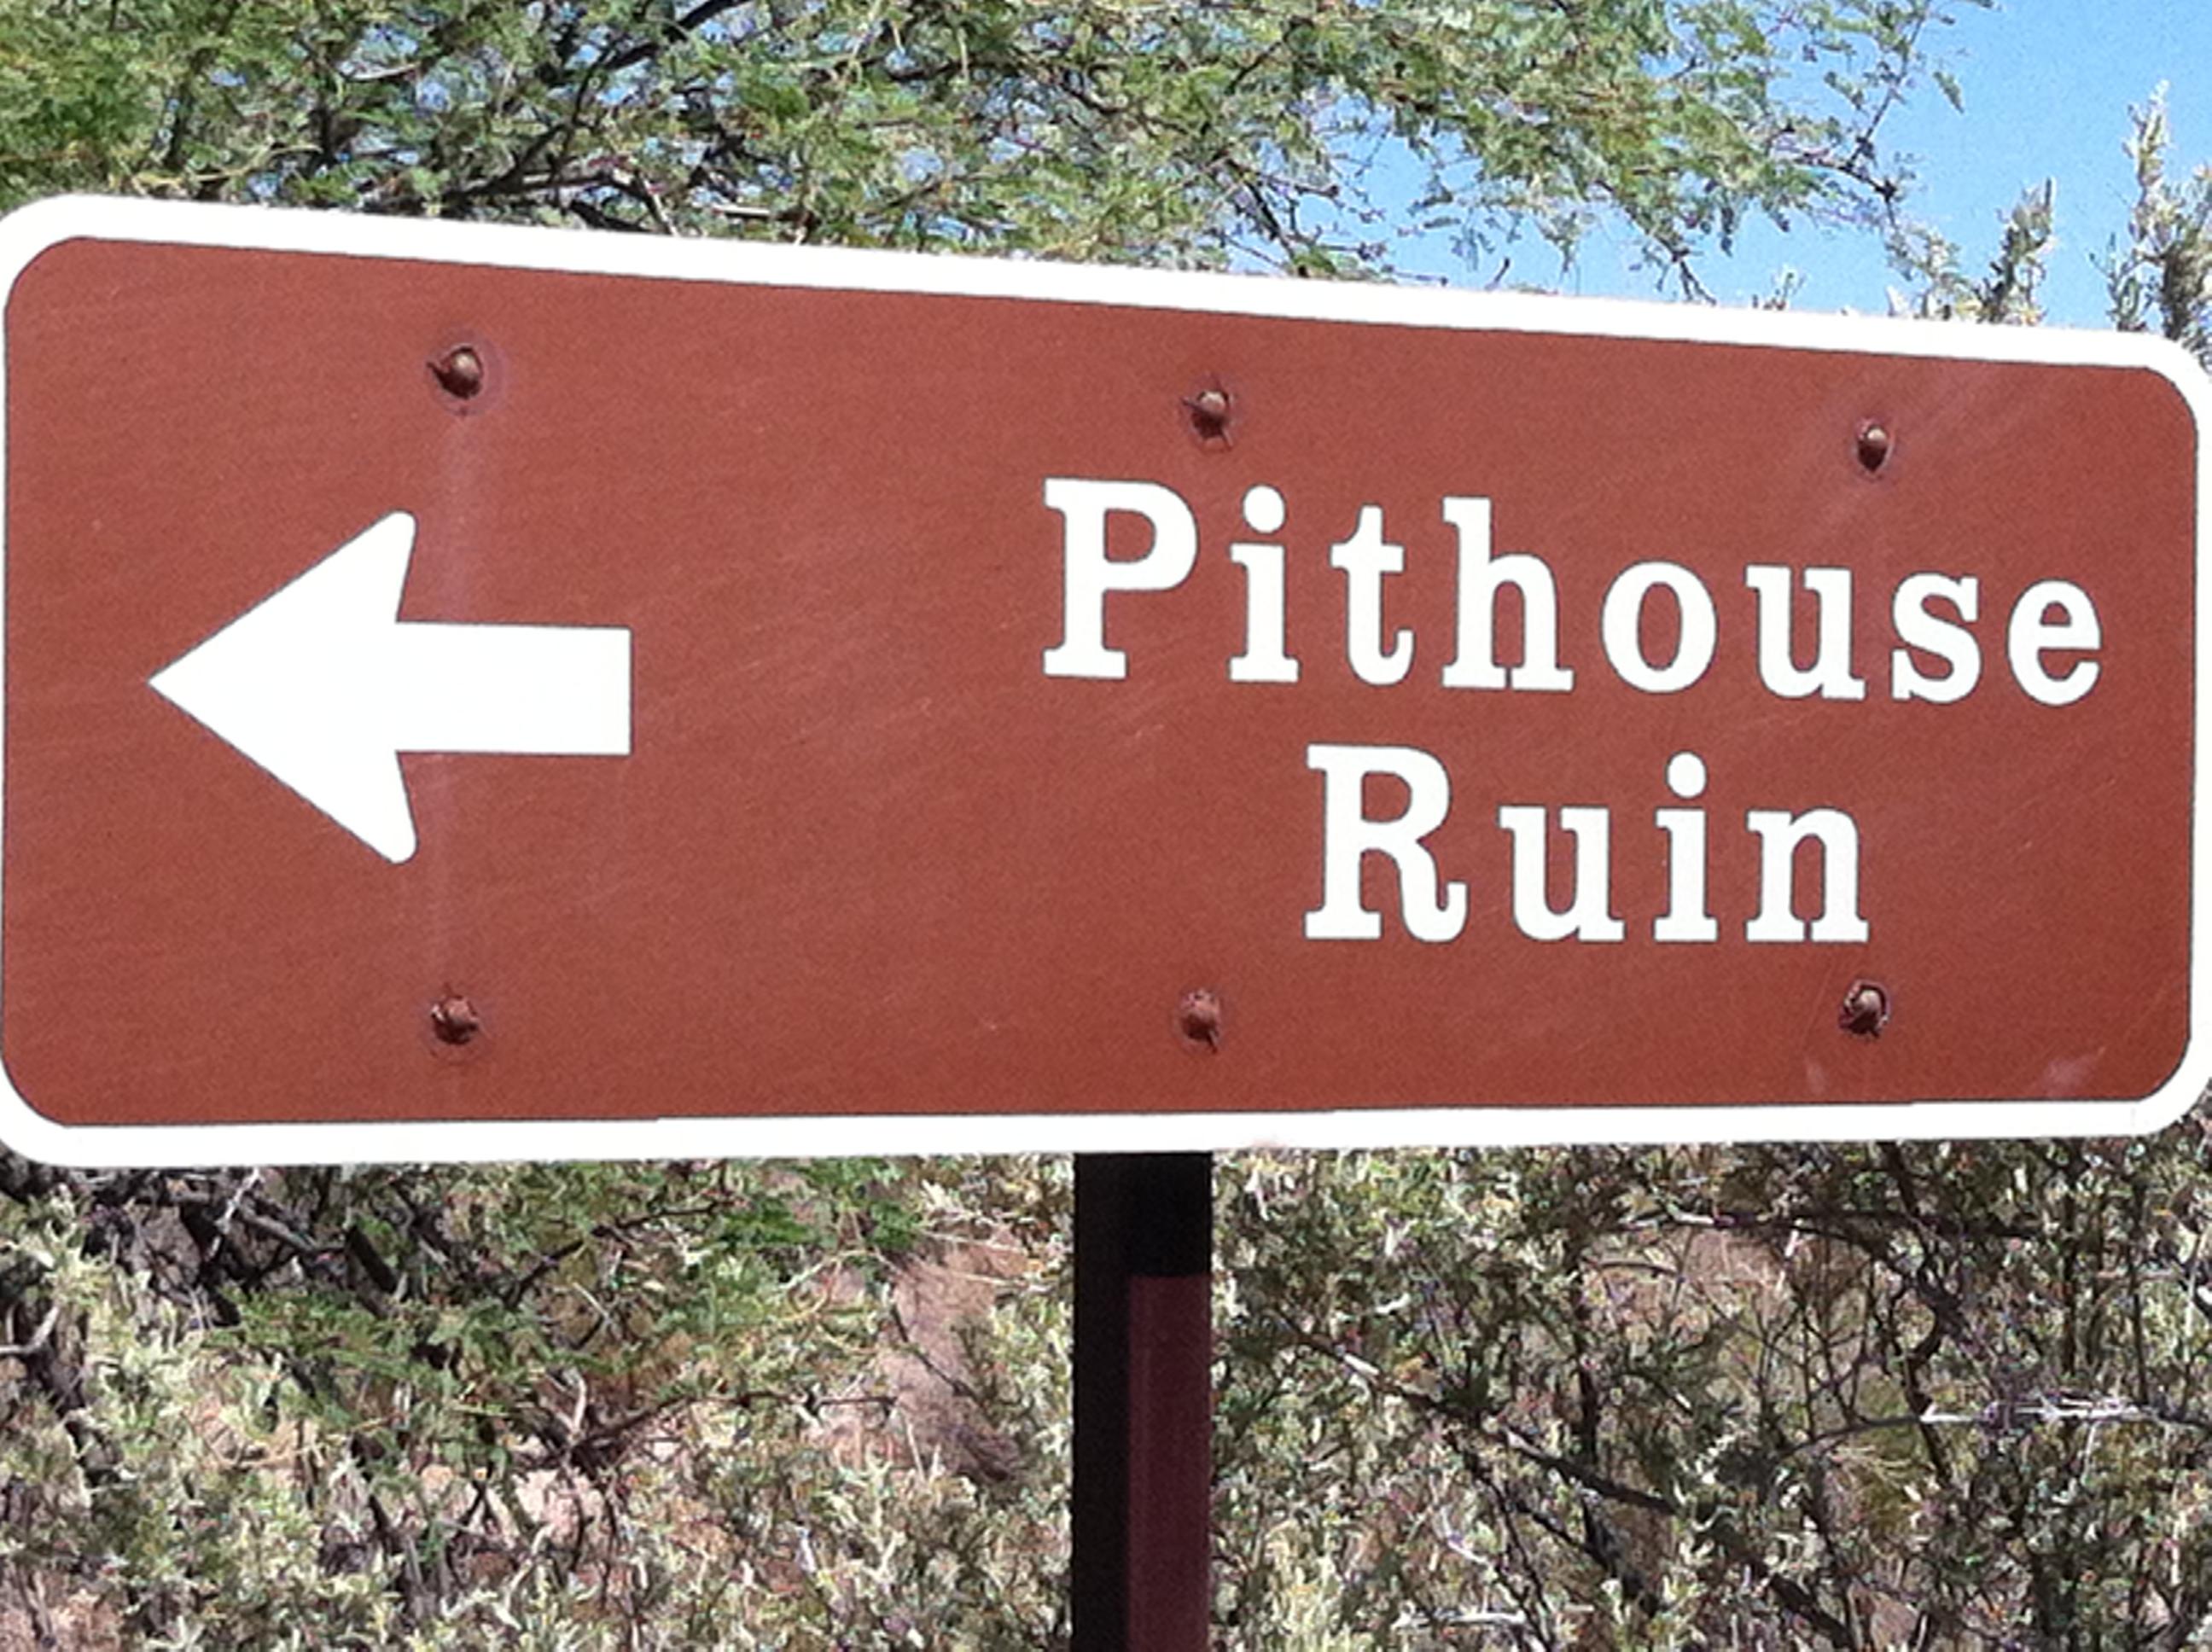 Pithouse Ruin